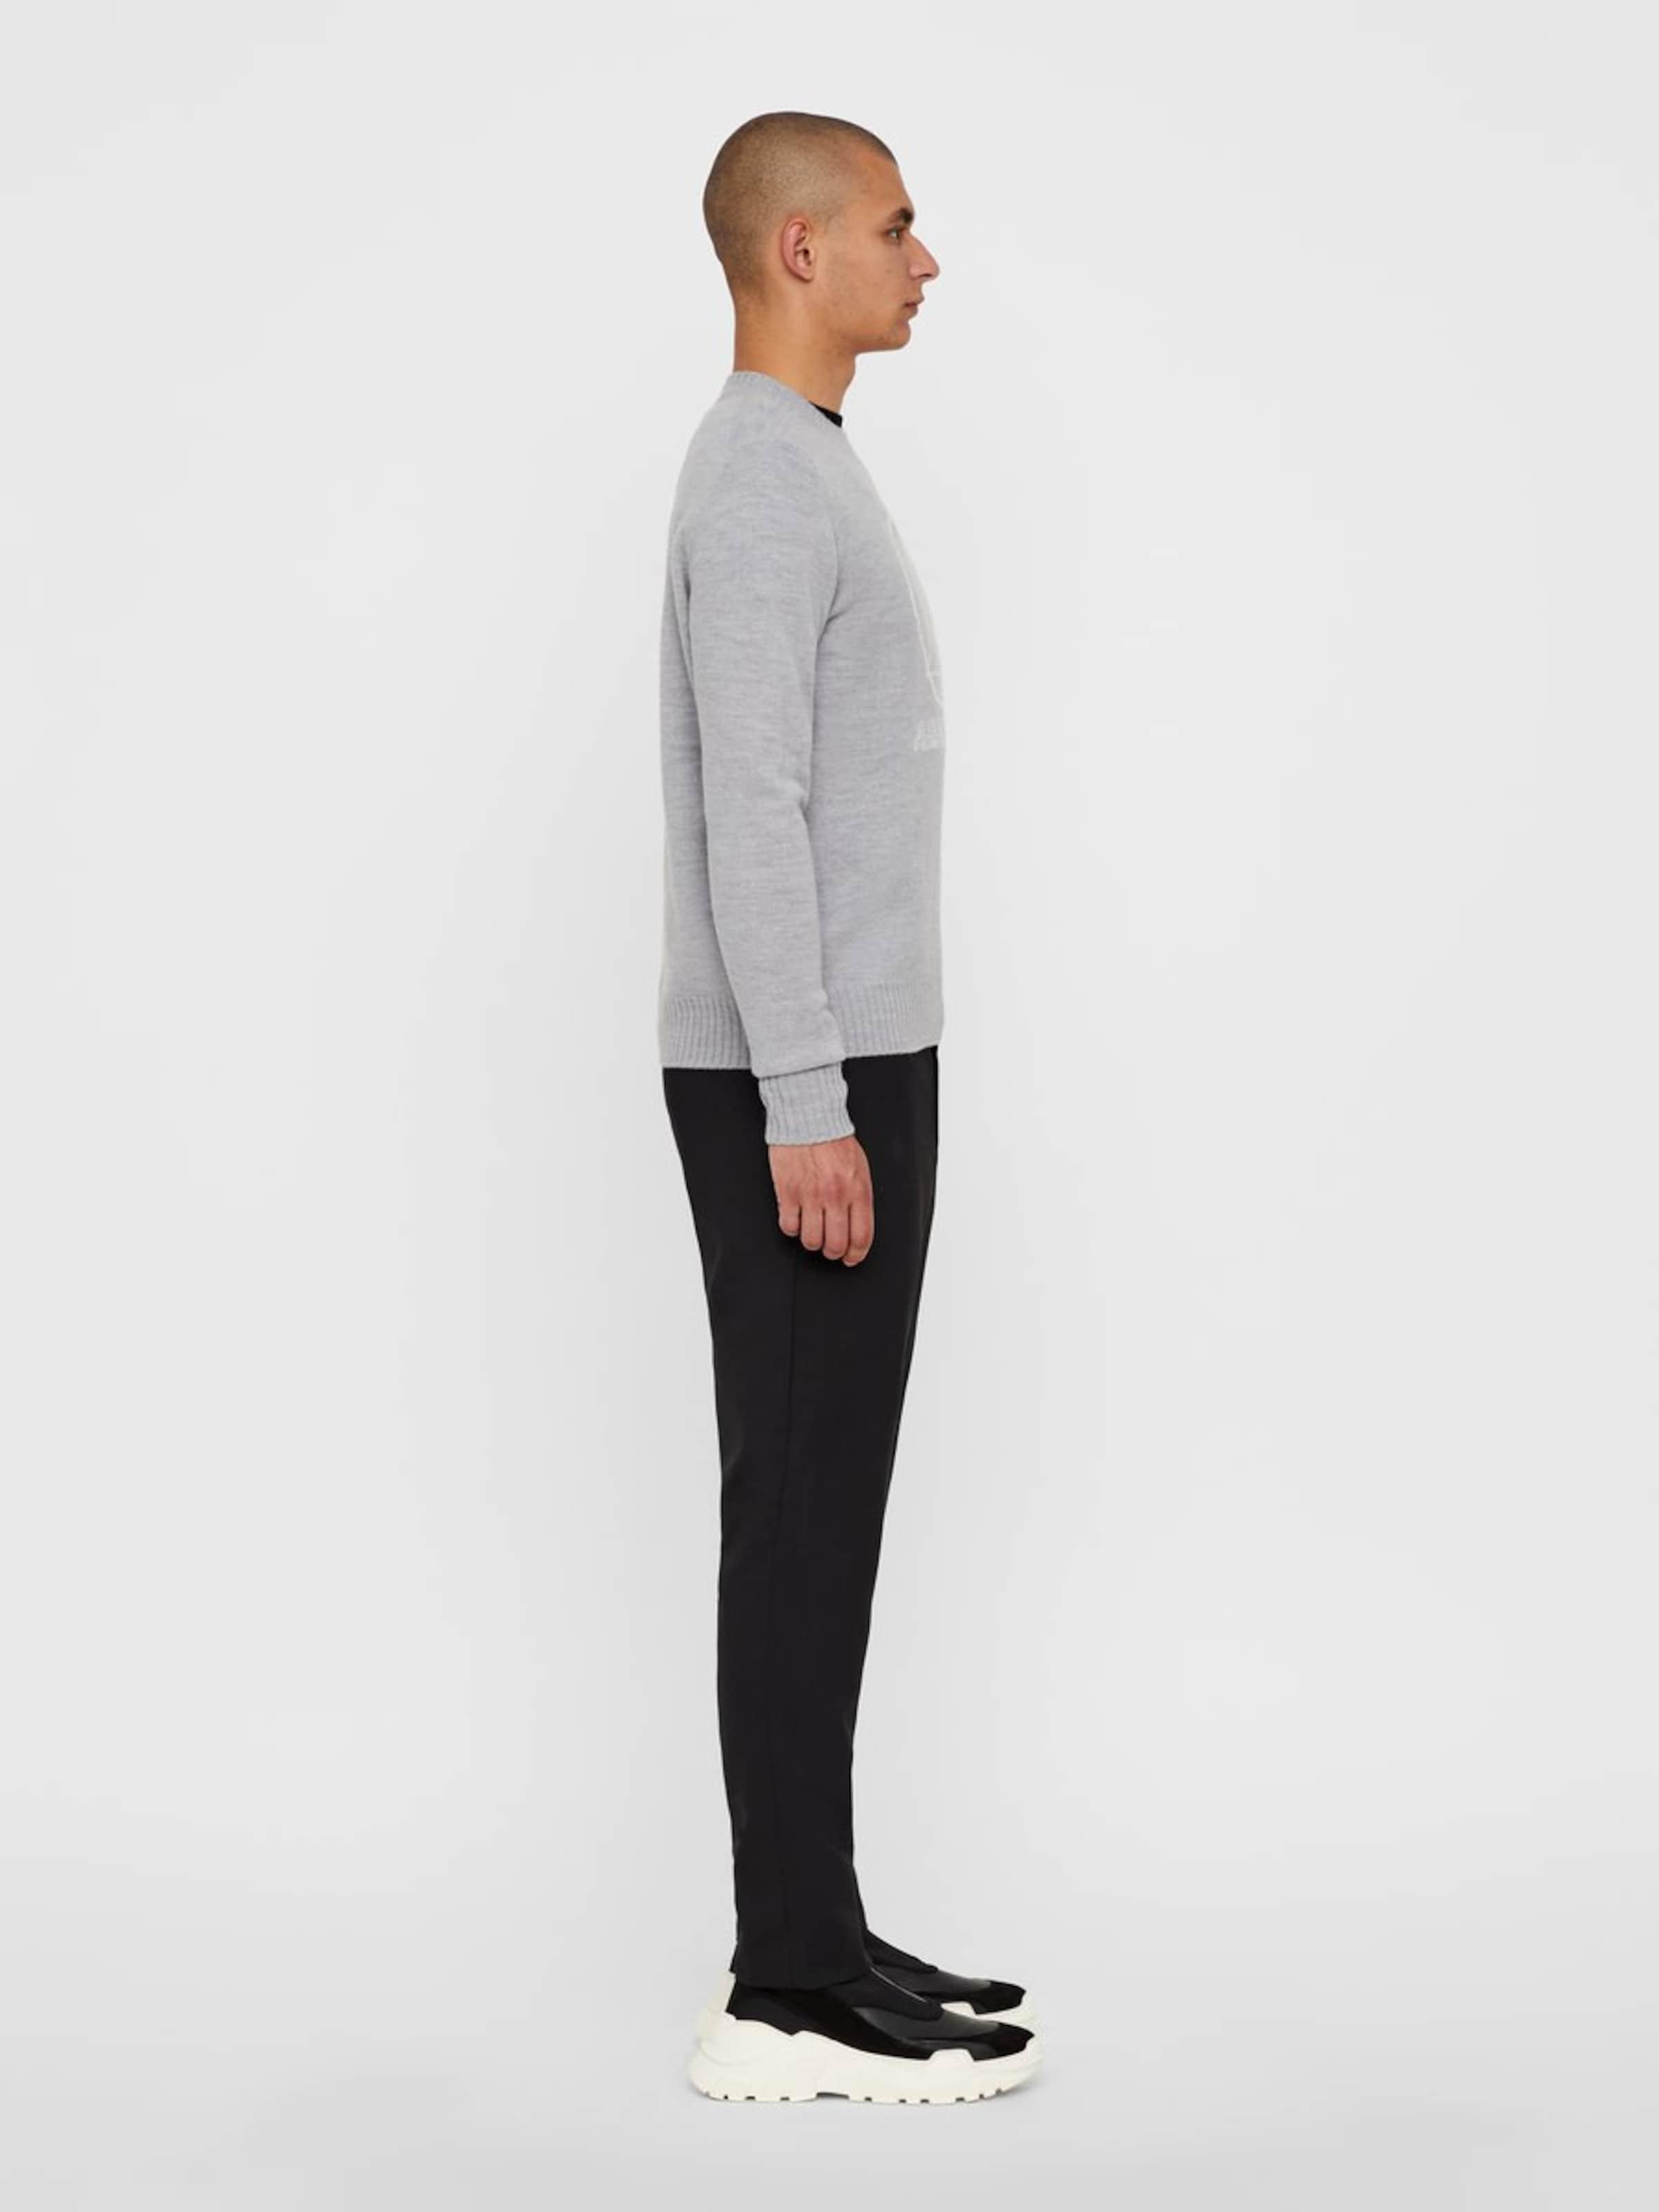 Wool' In Pullover J Grau lindeberg 'tristan dtCBQrhxs